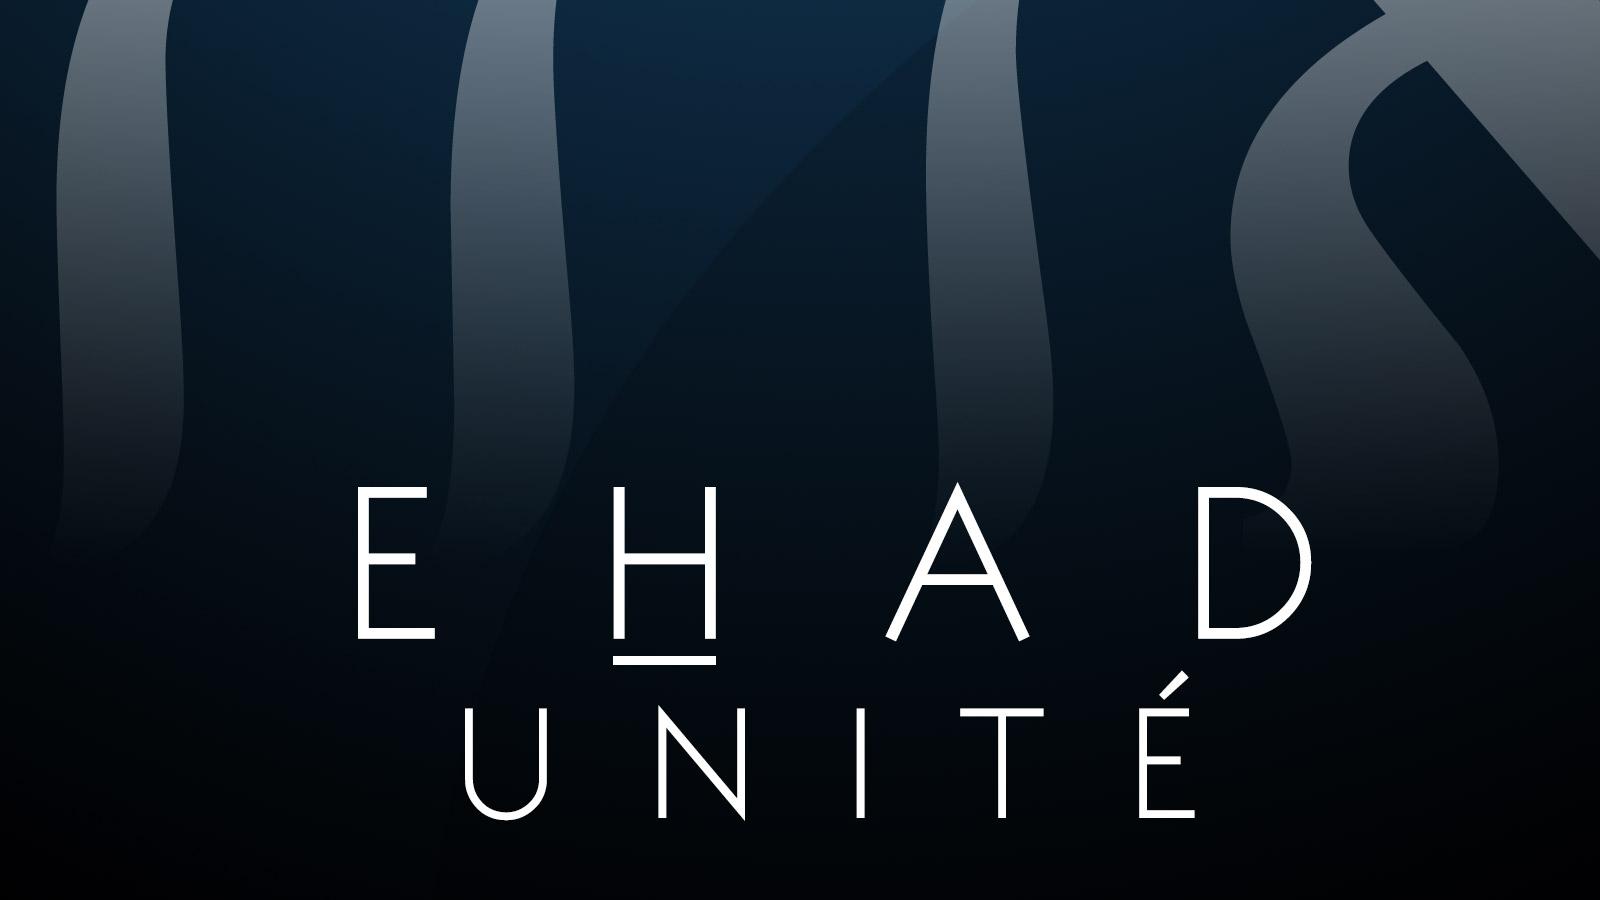 sublime-digital_ehad-unite-book-cover-04